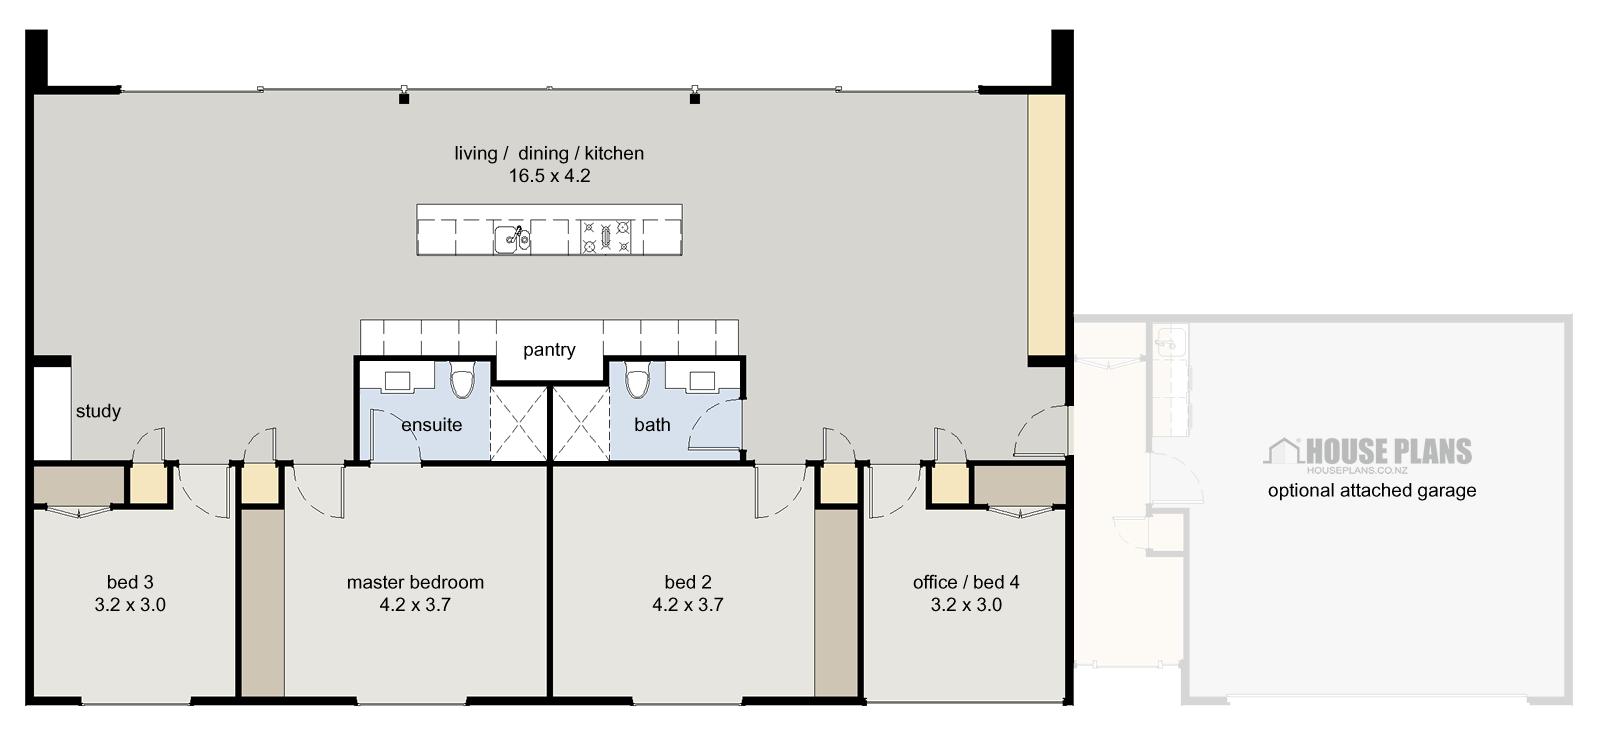 Pin By Clara Juwita On Hemp House House Plans Custom Design House Plans Garage Floor Plans